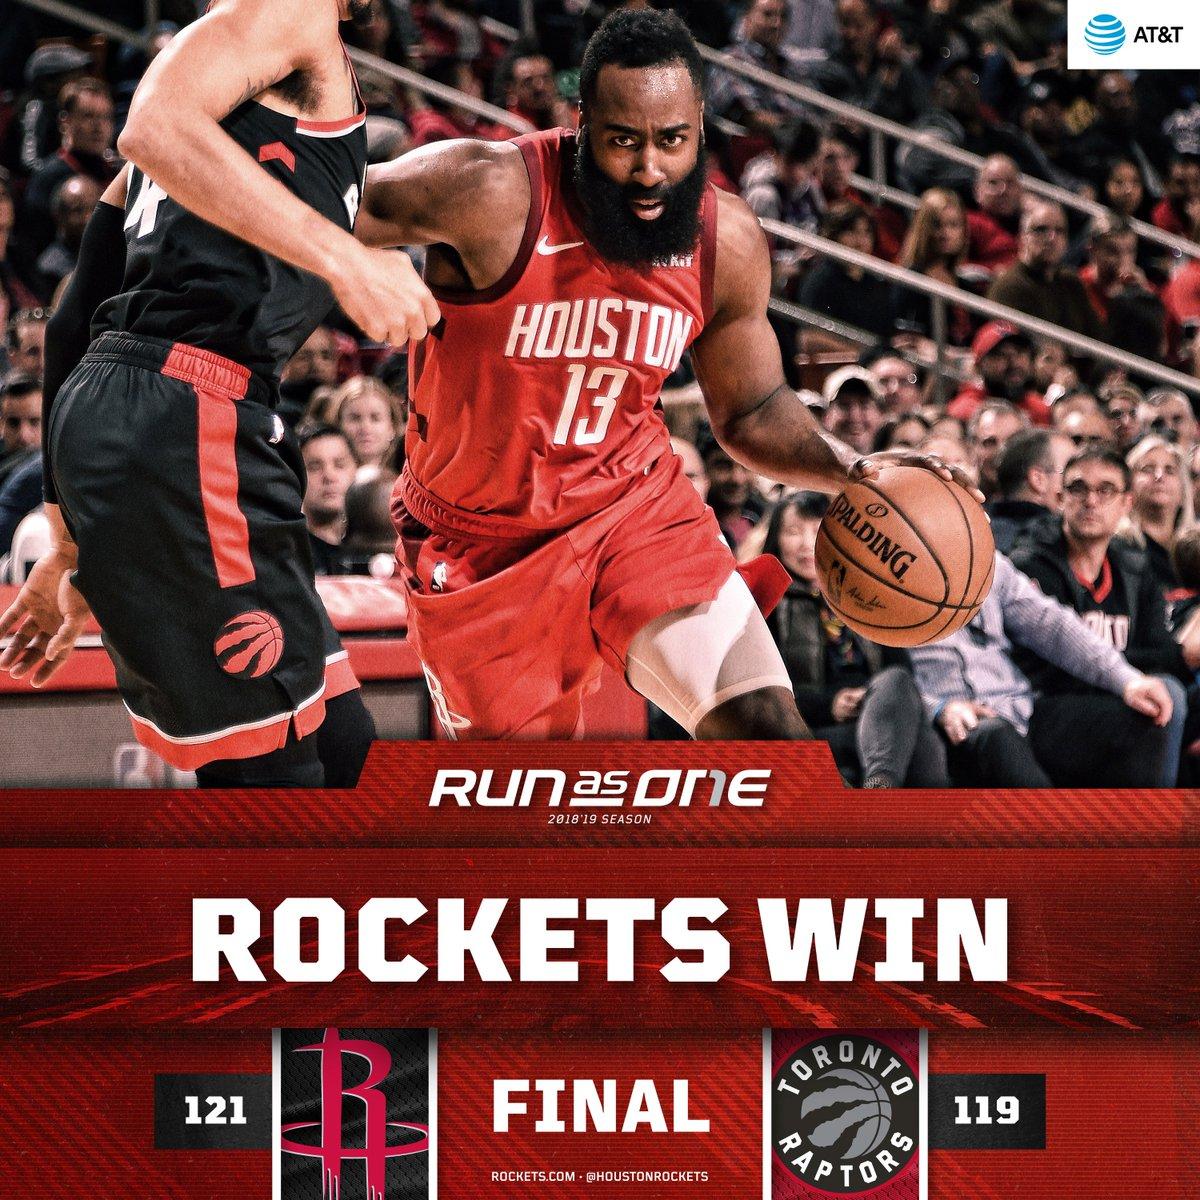 Houston Rockets News Trade: Big Friday Night Win In H-Town! Https://t.co/VyoBwdIMGN